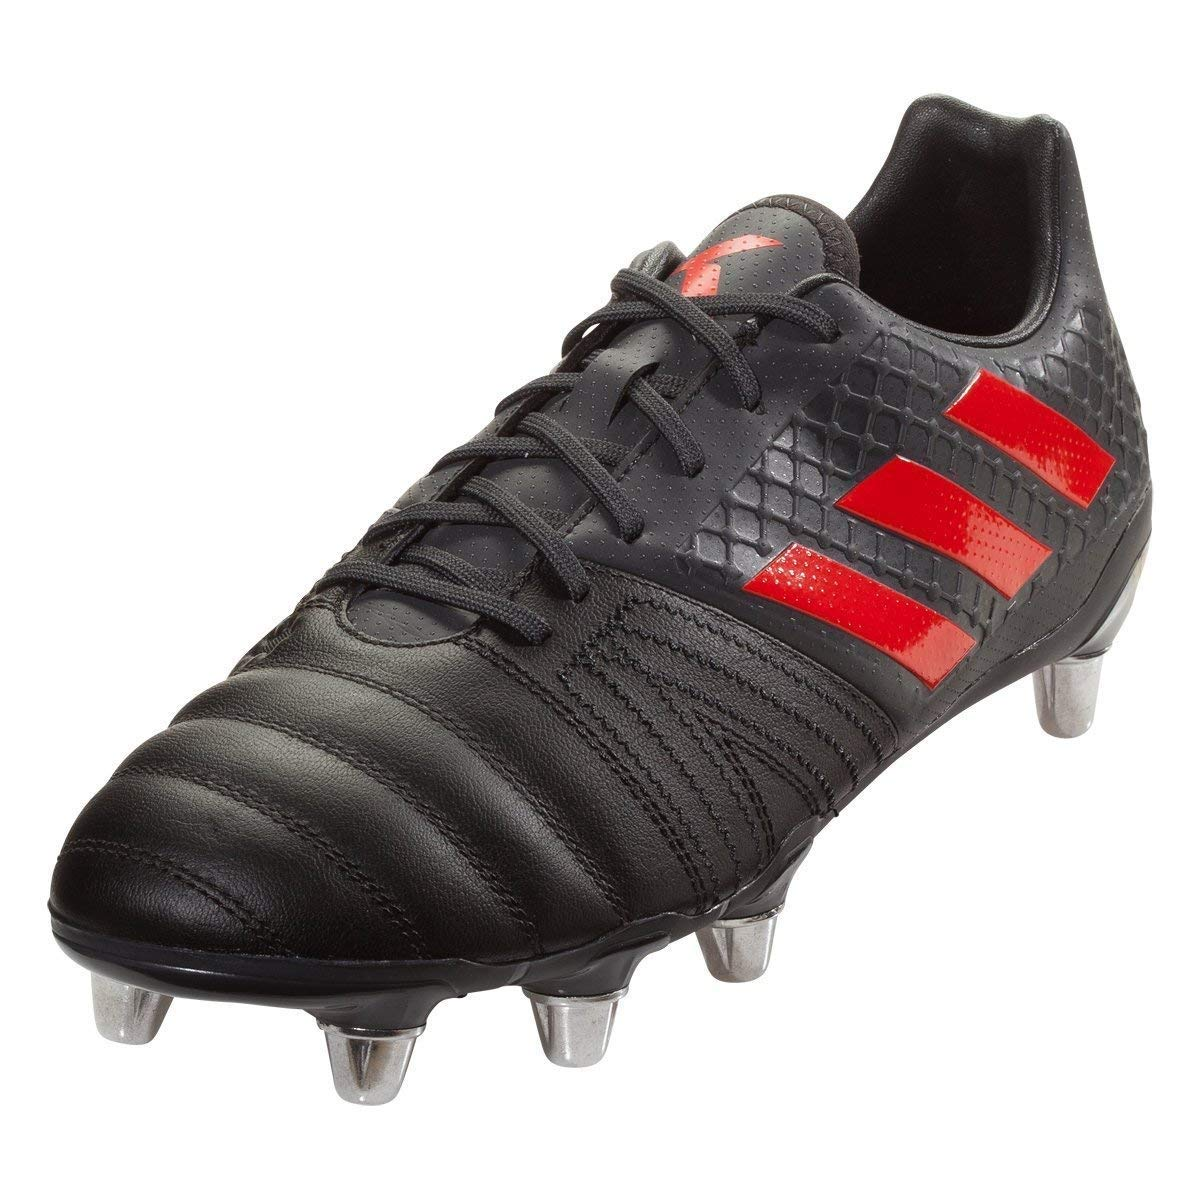 adidas Kakari Elite SG Rugby Boot, Black CM7443